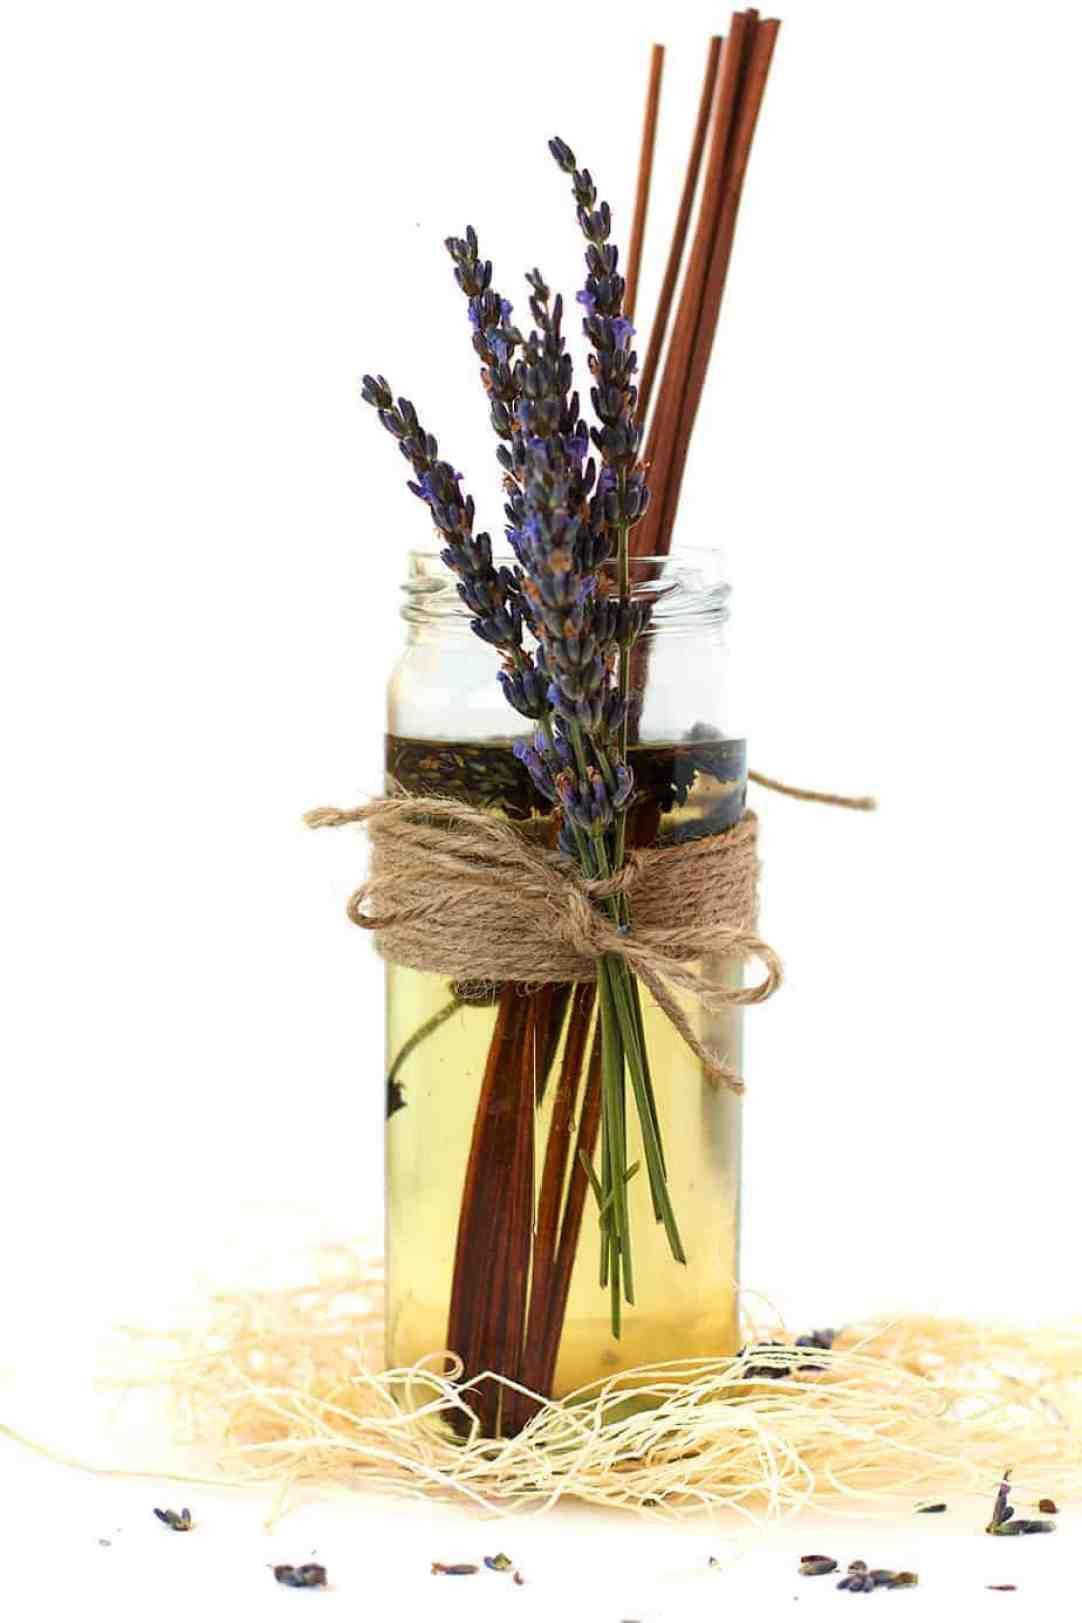 DIY Lavender Oil Diffuser